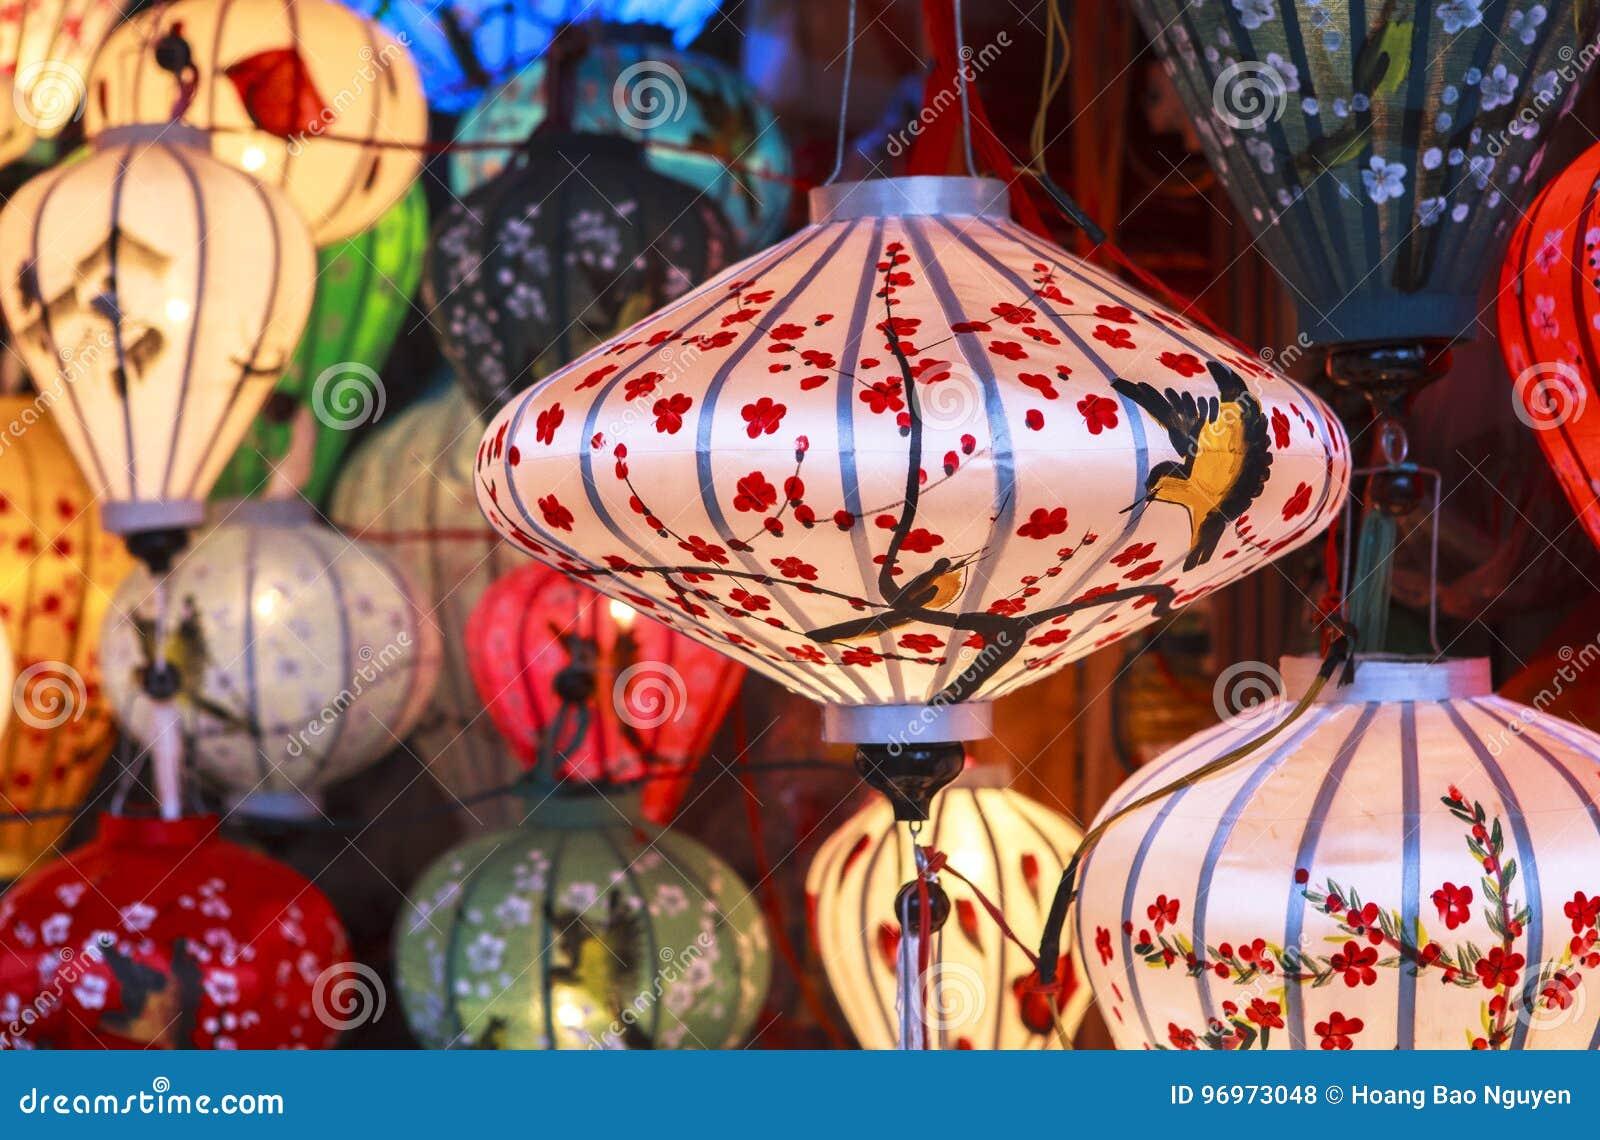 Lanterns In Old Street Hoi An, Vietnam Stock Photo - Image